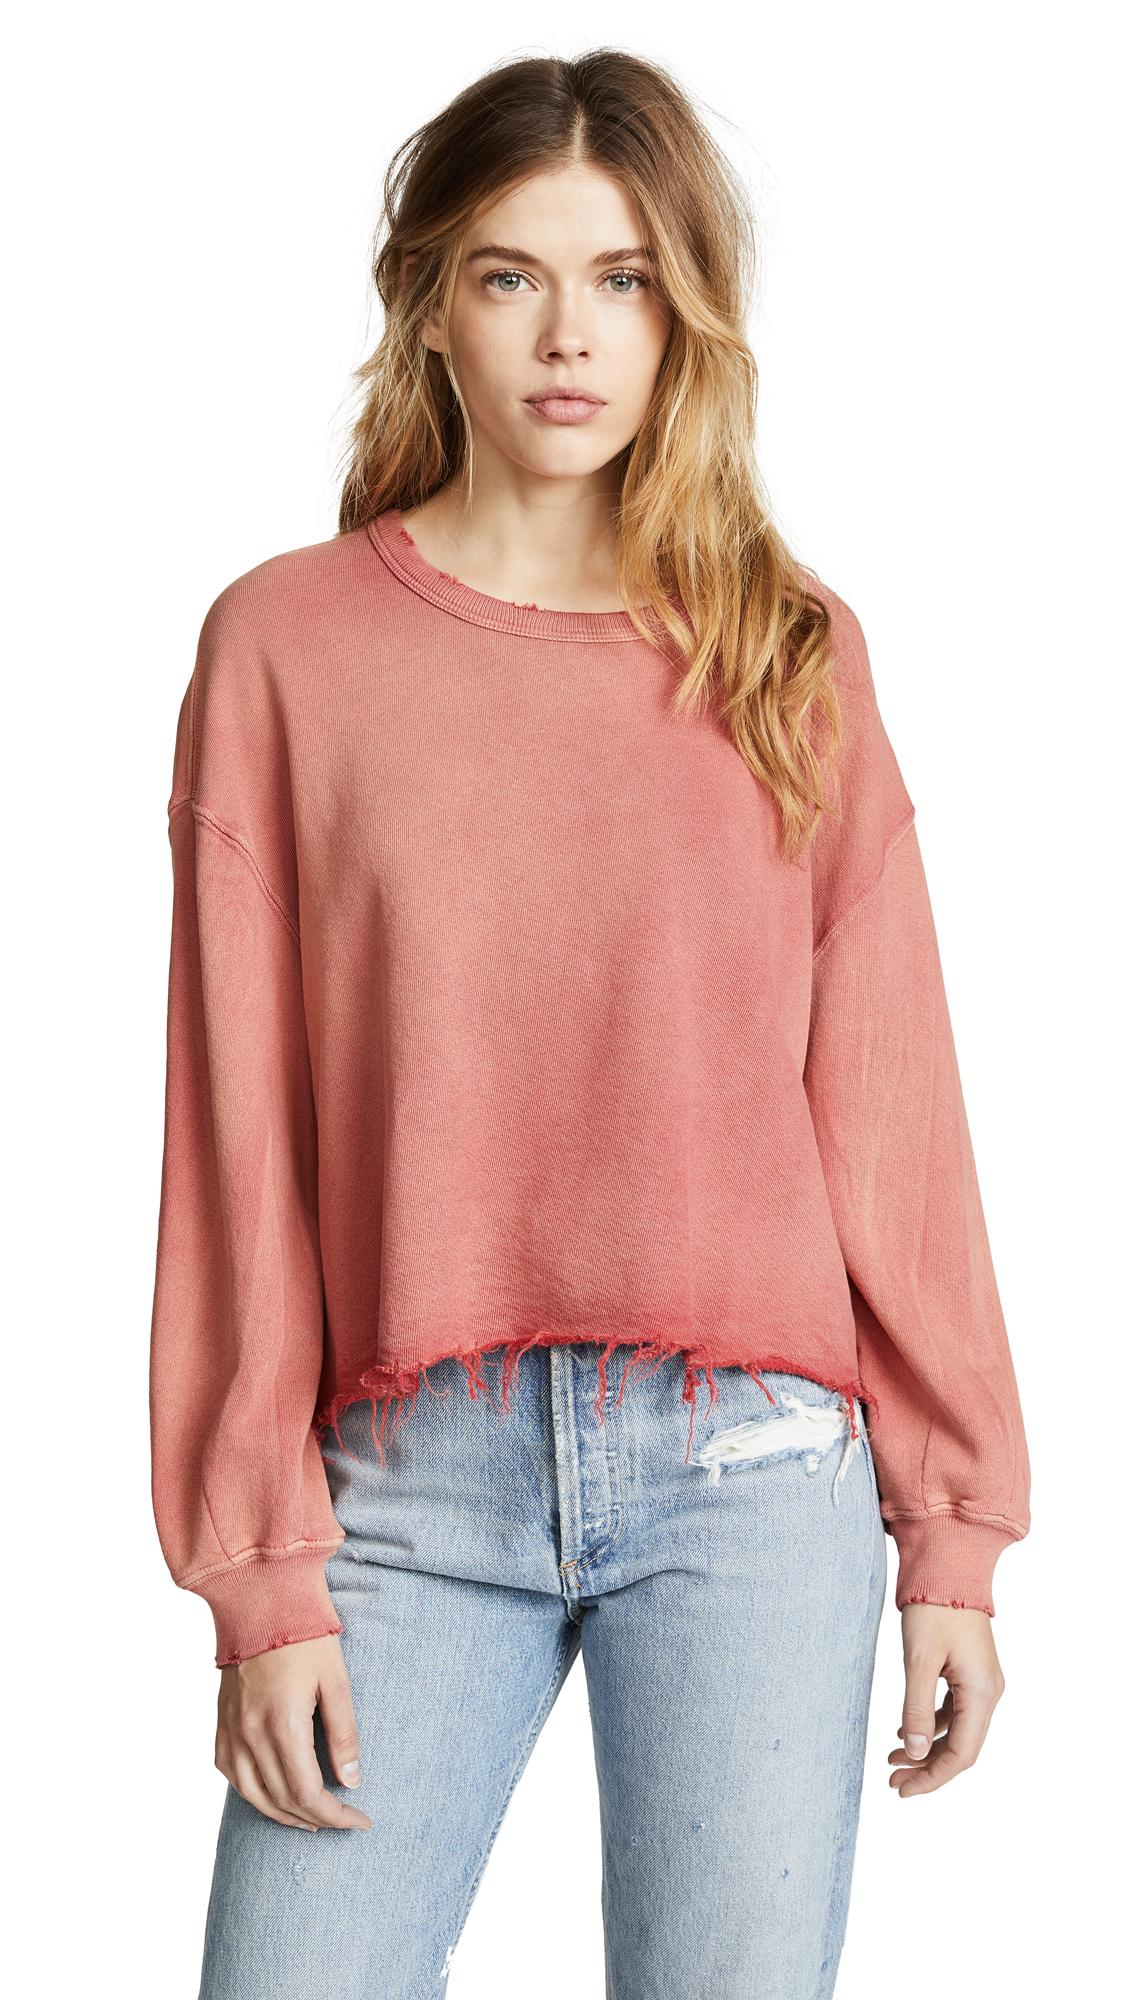 51cd69f9dc5 The Great The Cut Off Sweatshirt In Rhubarb